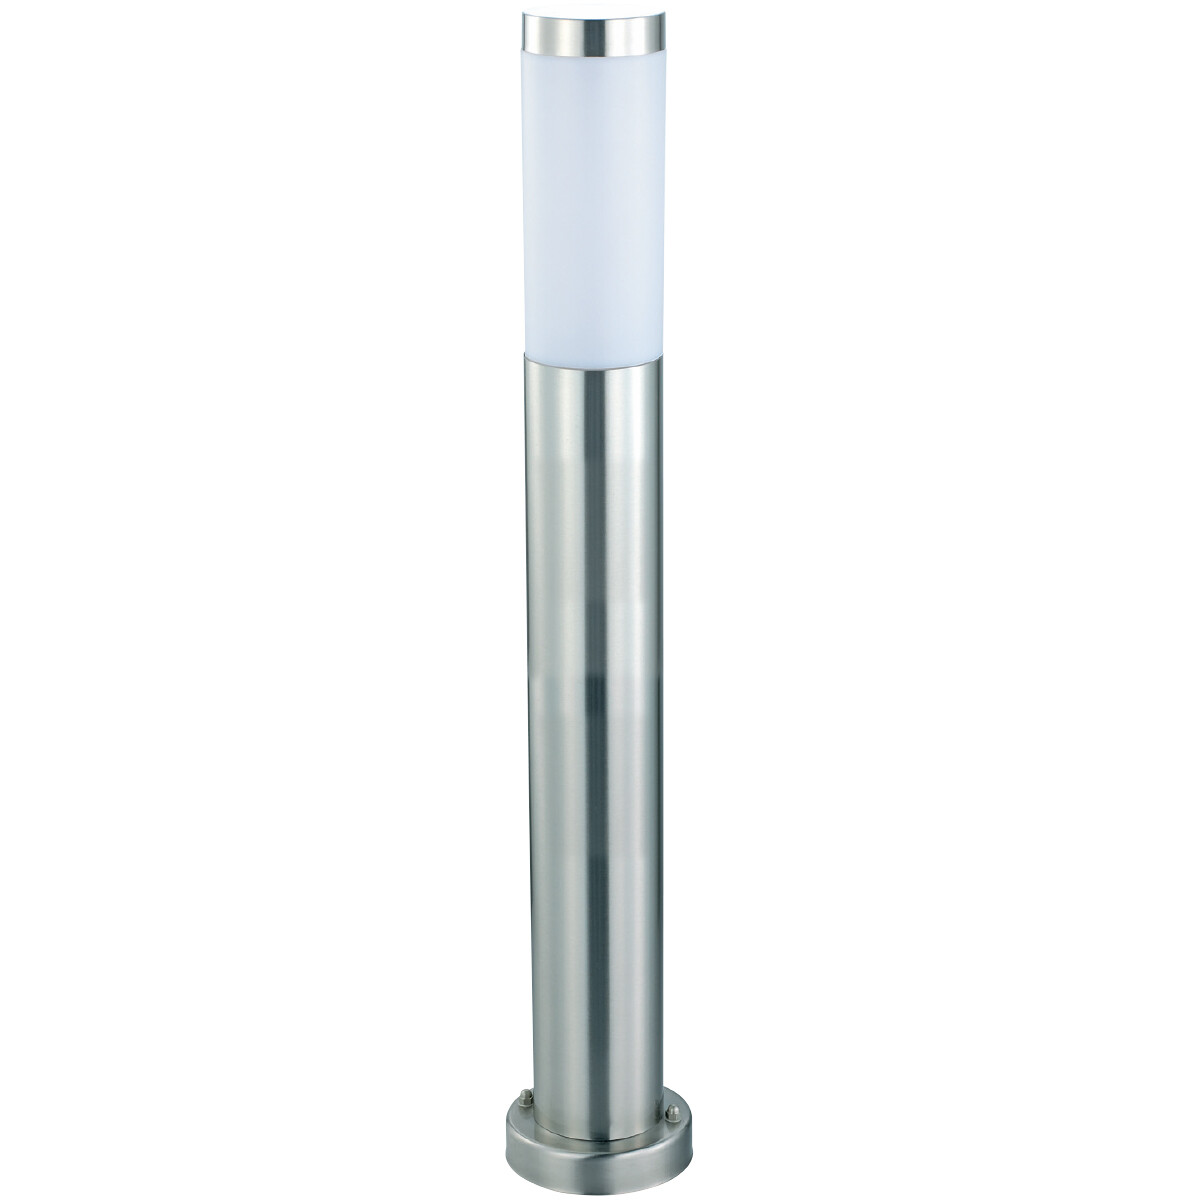 PHILIPS - LED Tuinverlichting - Staande Buitenlamp - CorePro LEDbulb 827 A60 - Laurea 5 - E27 Fittin